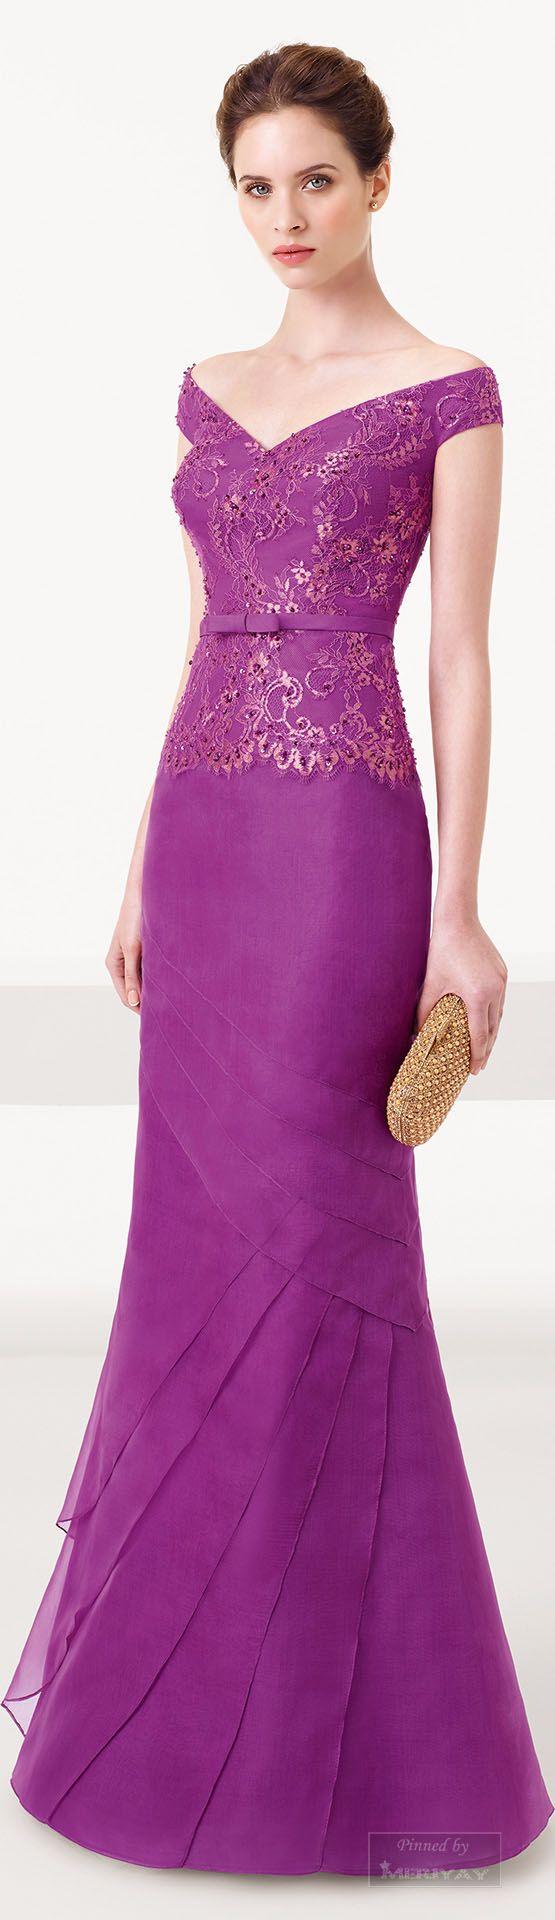 Precios vestidos fiesta aire barcelona 2015 – Moda Española moderna